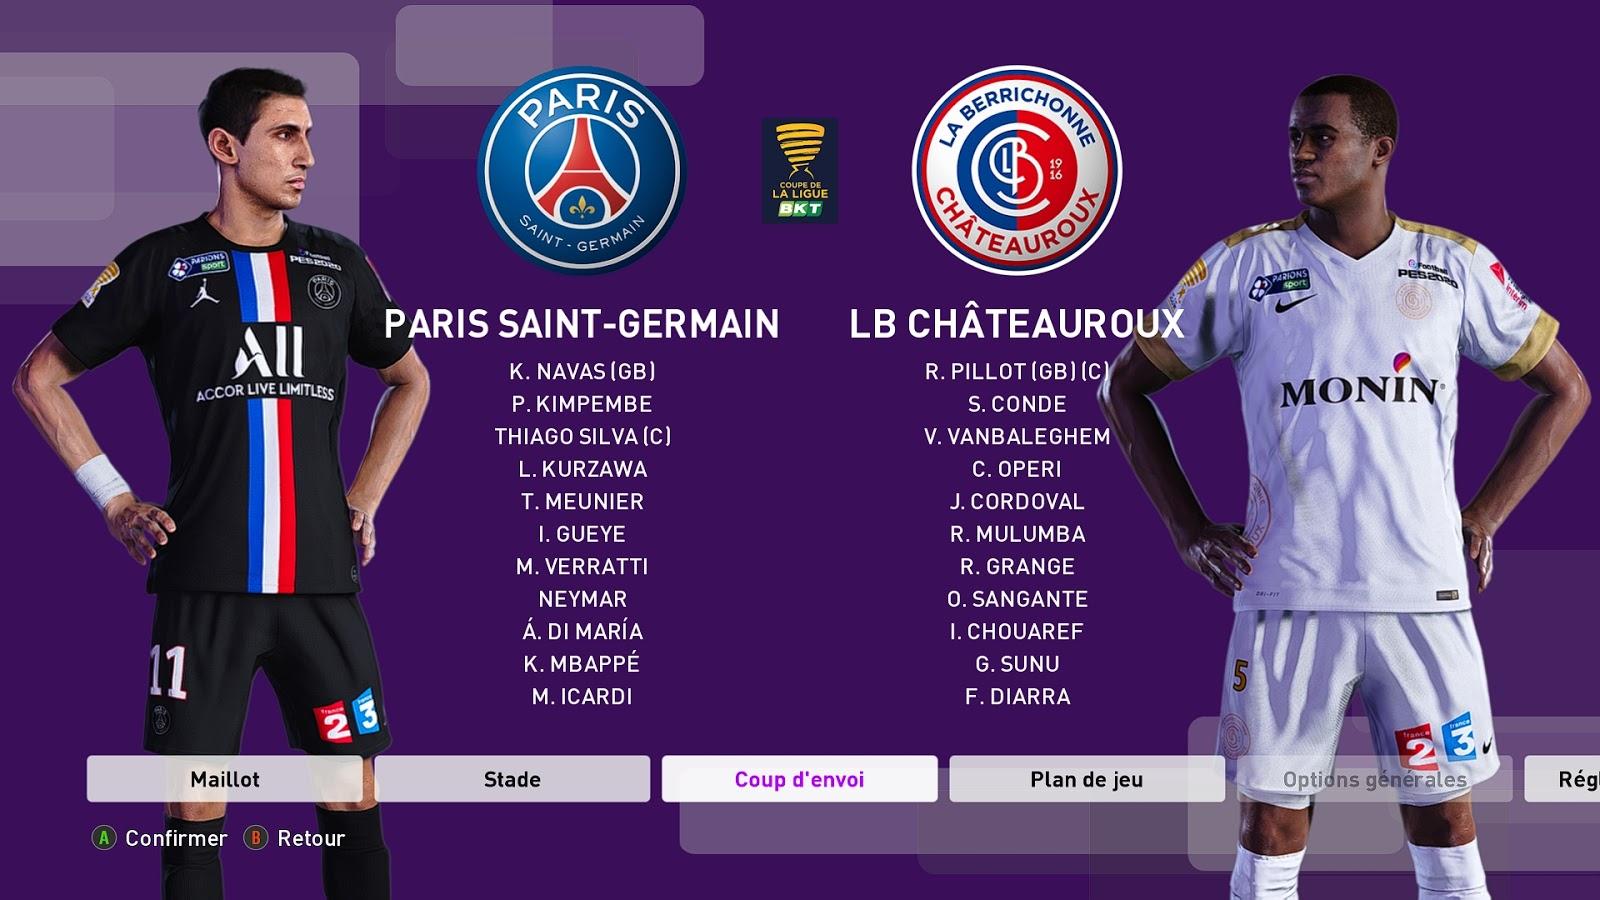 PES 2020 Kitpack Ligue 1/Ligue 2 For Kitserver 2020 By